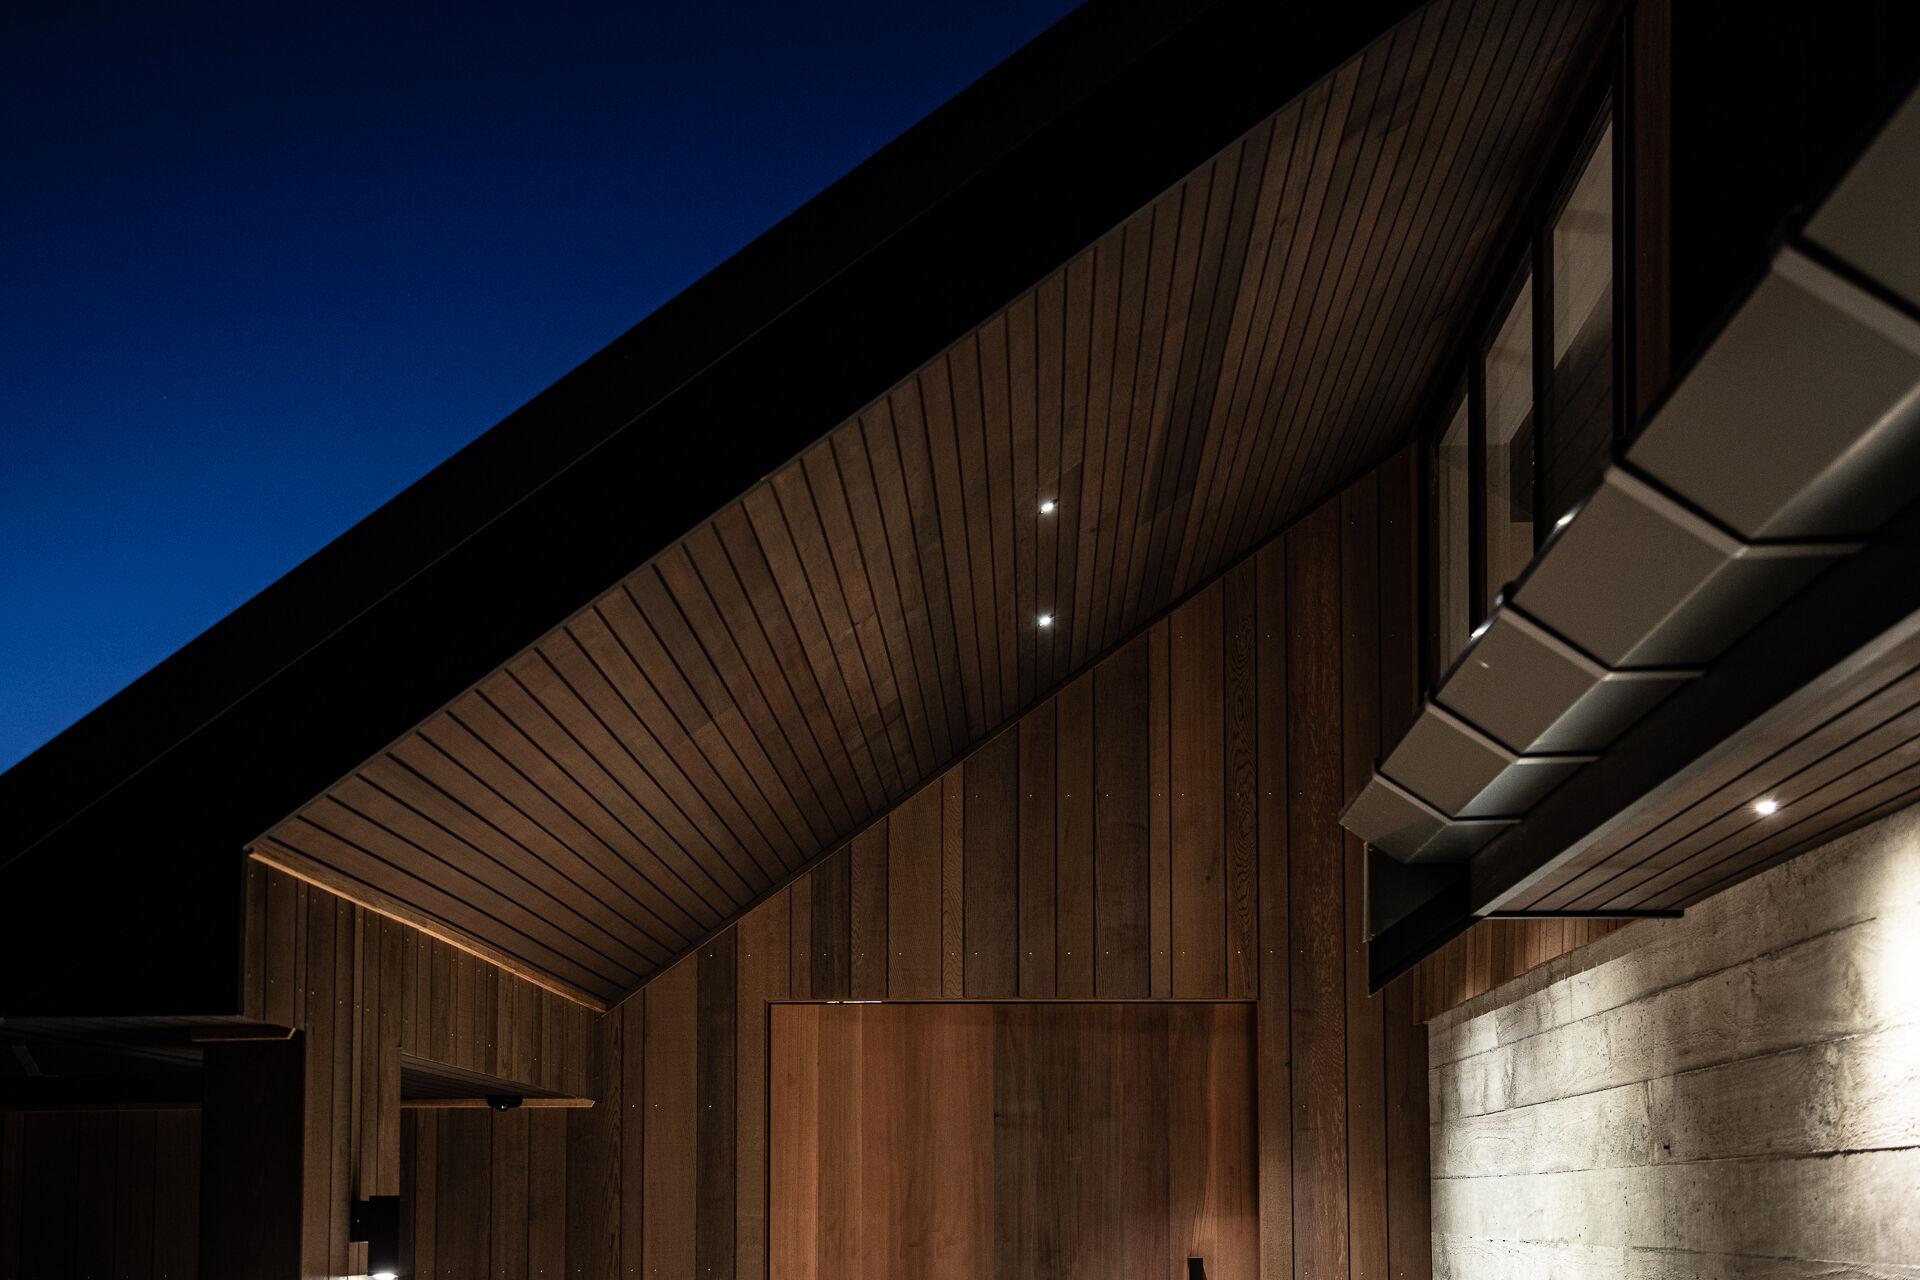 Cedar cladding and boardmark concrete wall and pivot cedar oversized door to match